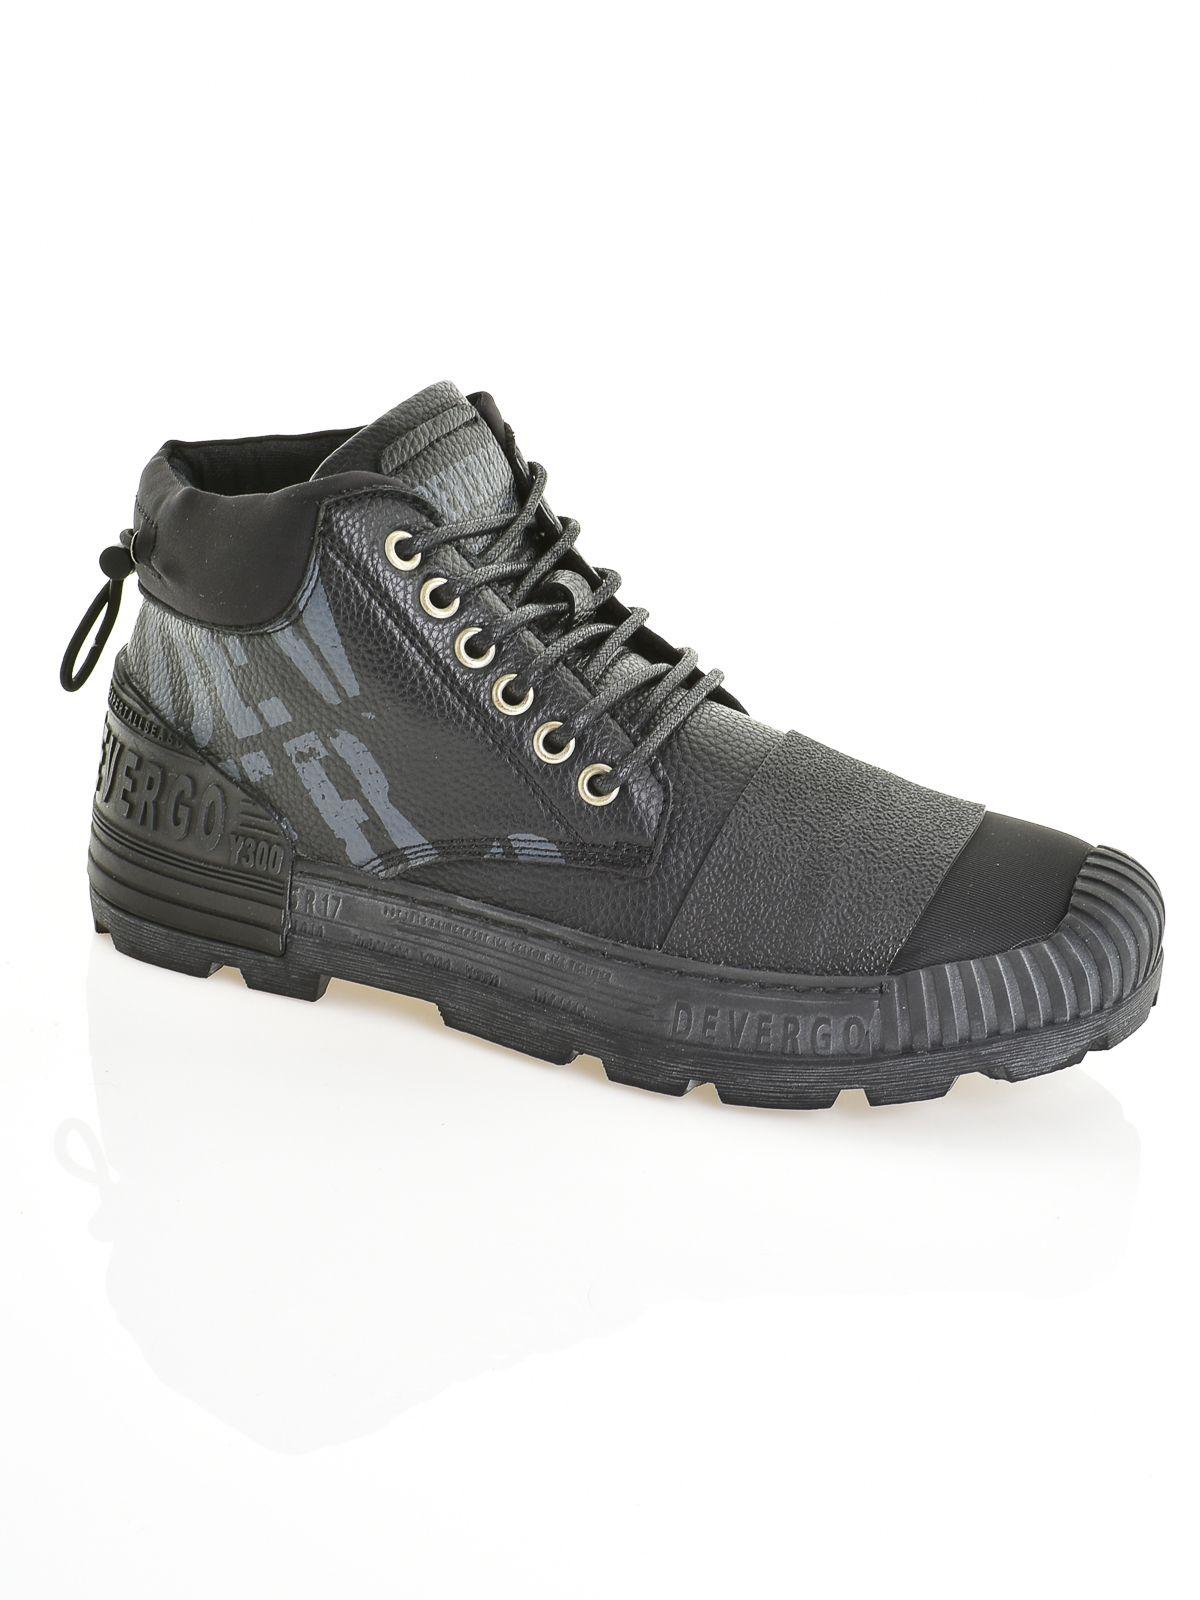 Devergo férfi magasszárú cipő METEOR PU ... 35b5461eb4